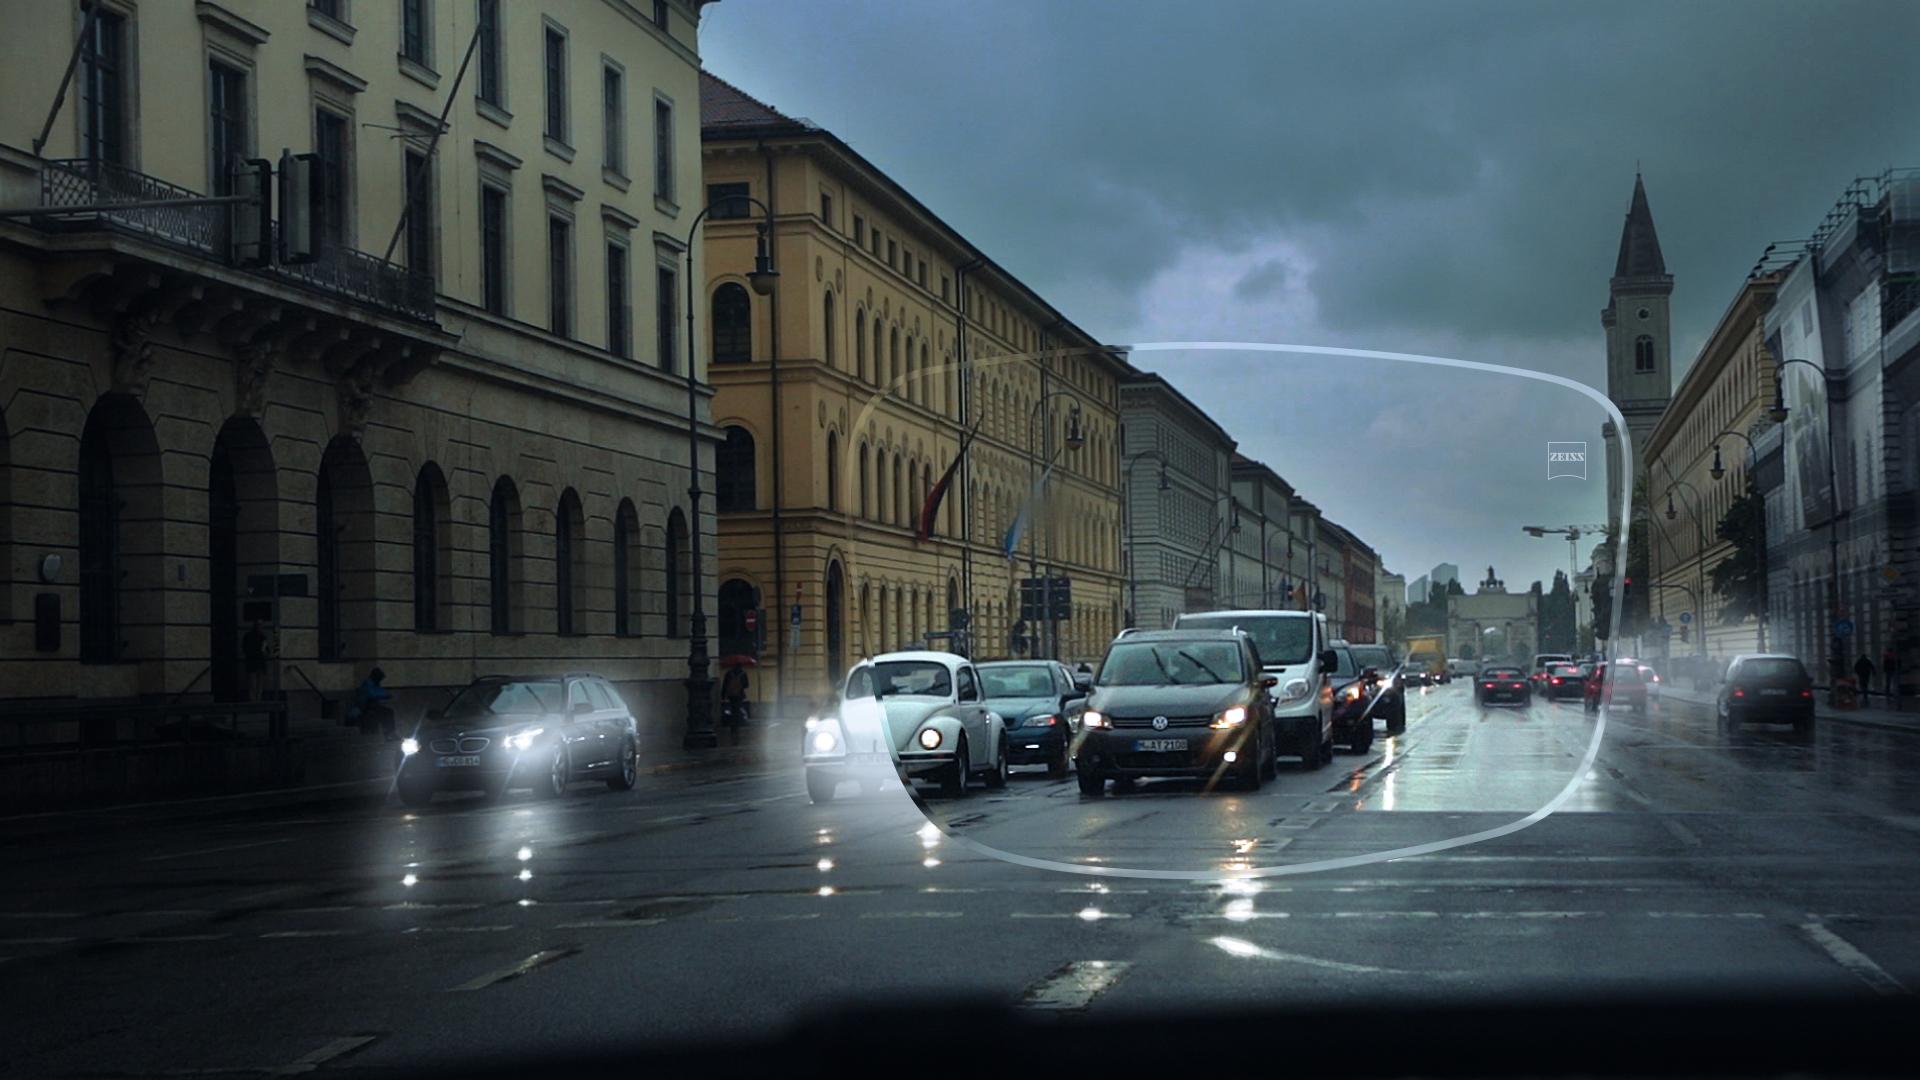 DriveSafe2019_City_Regenfahrt_BrillenglasShield_300dpi